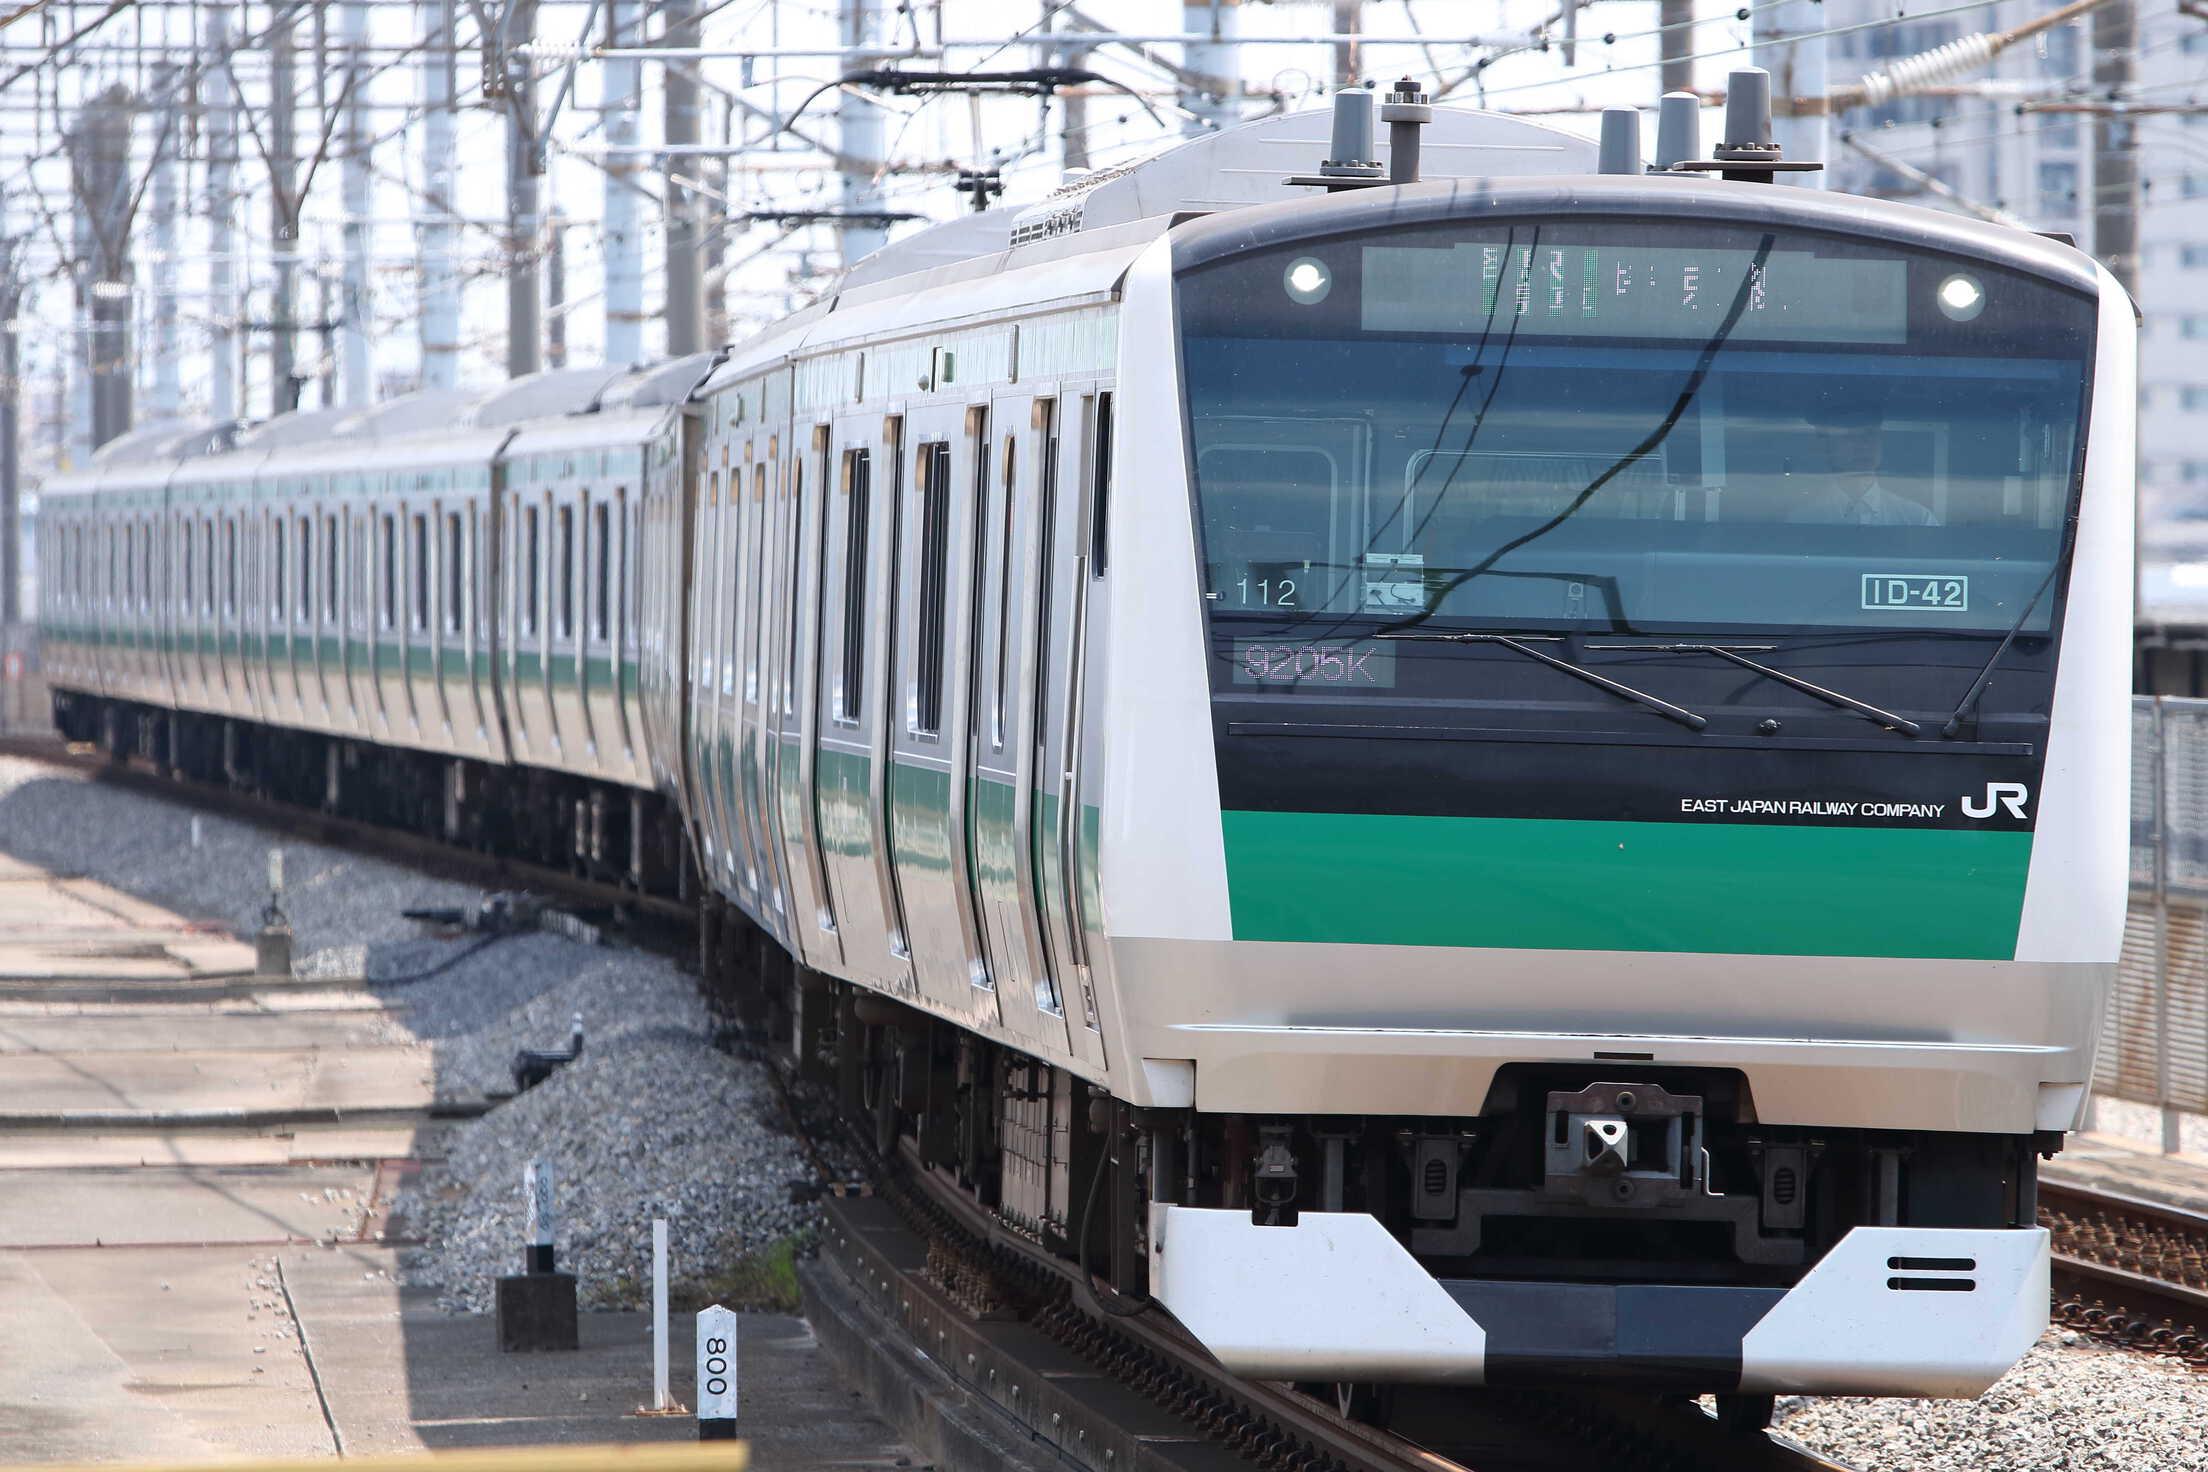 9205K(シク〜オオ) 渋谷駅線路切り替え工事に伴う臨時列車 E233系 宮ハエ112編成